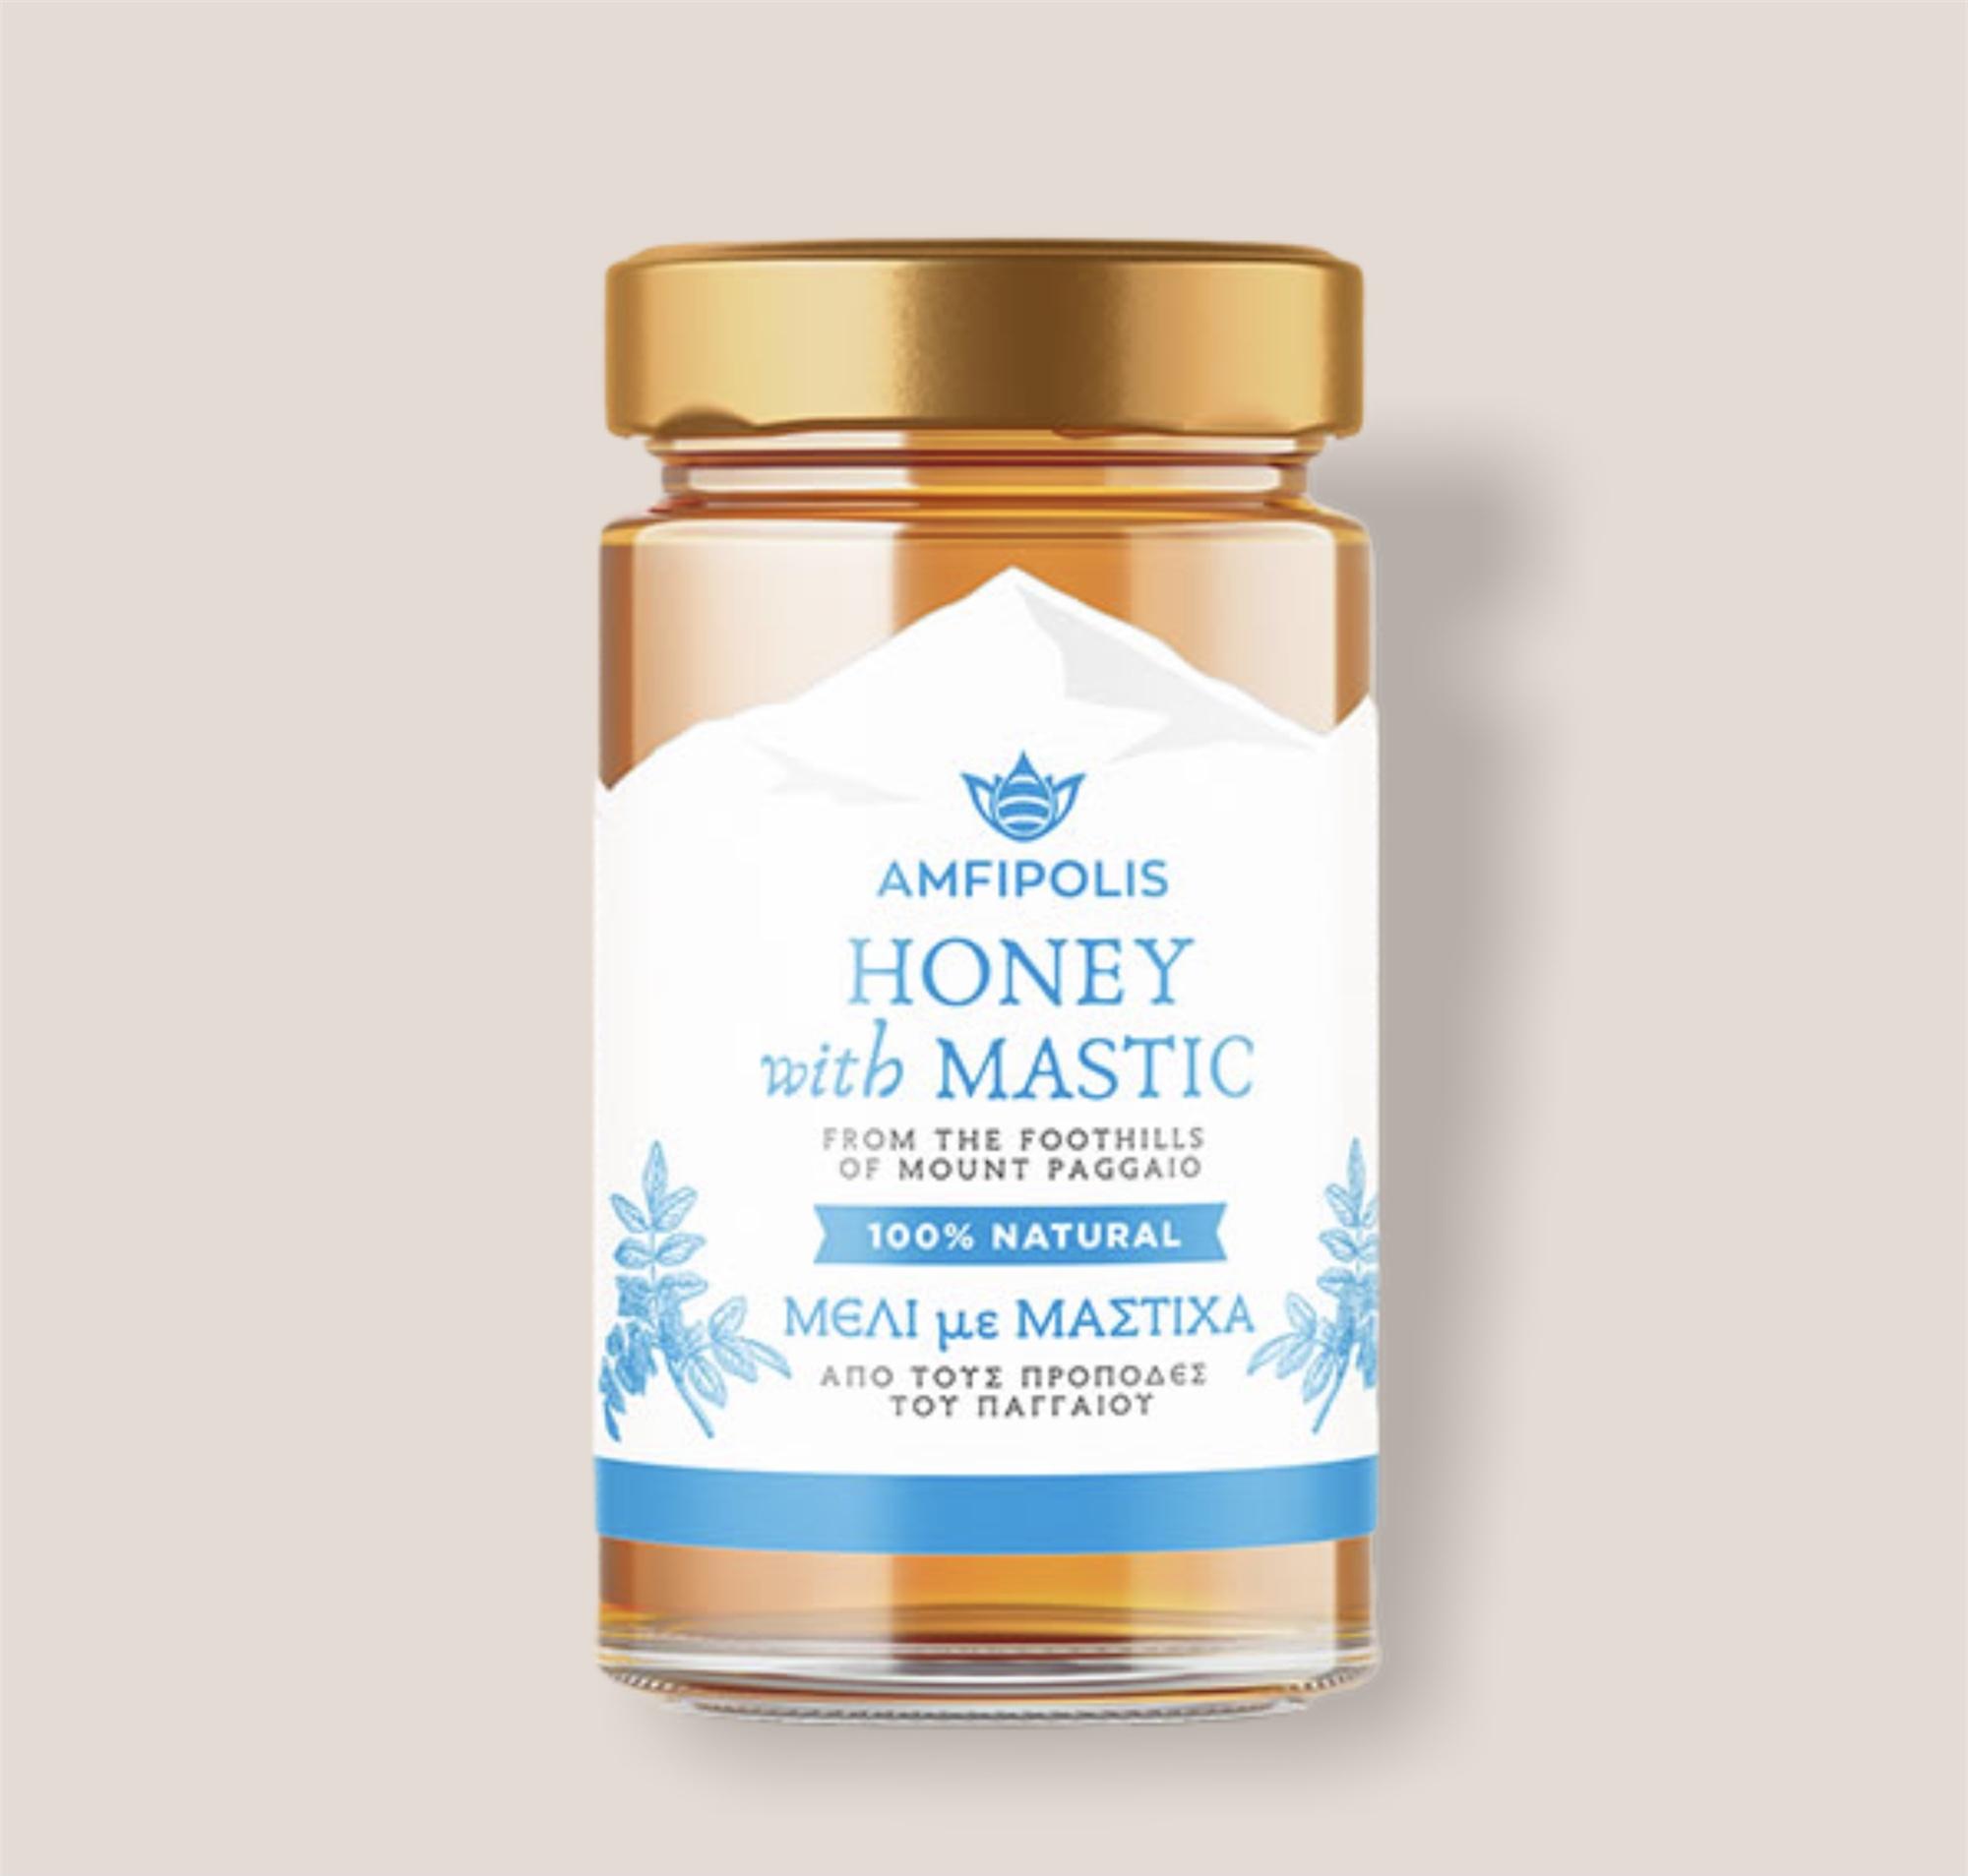 Amfipolis Honey with Mastic 400g